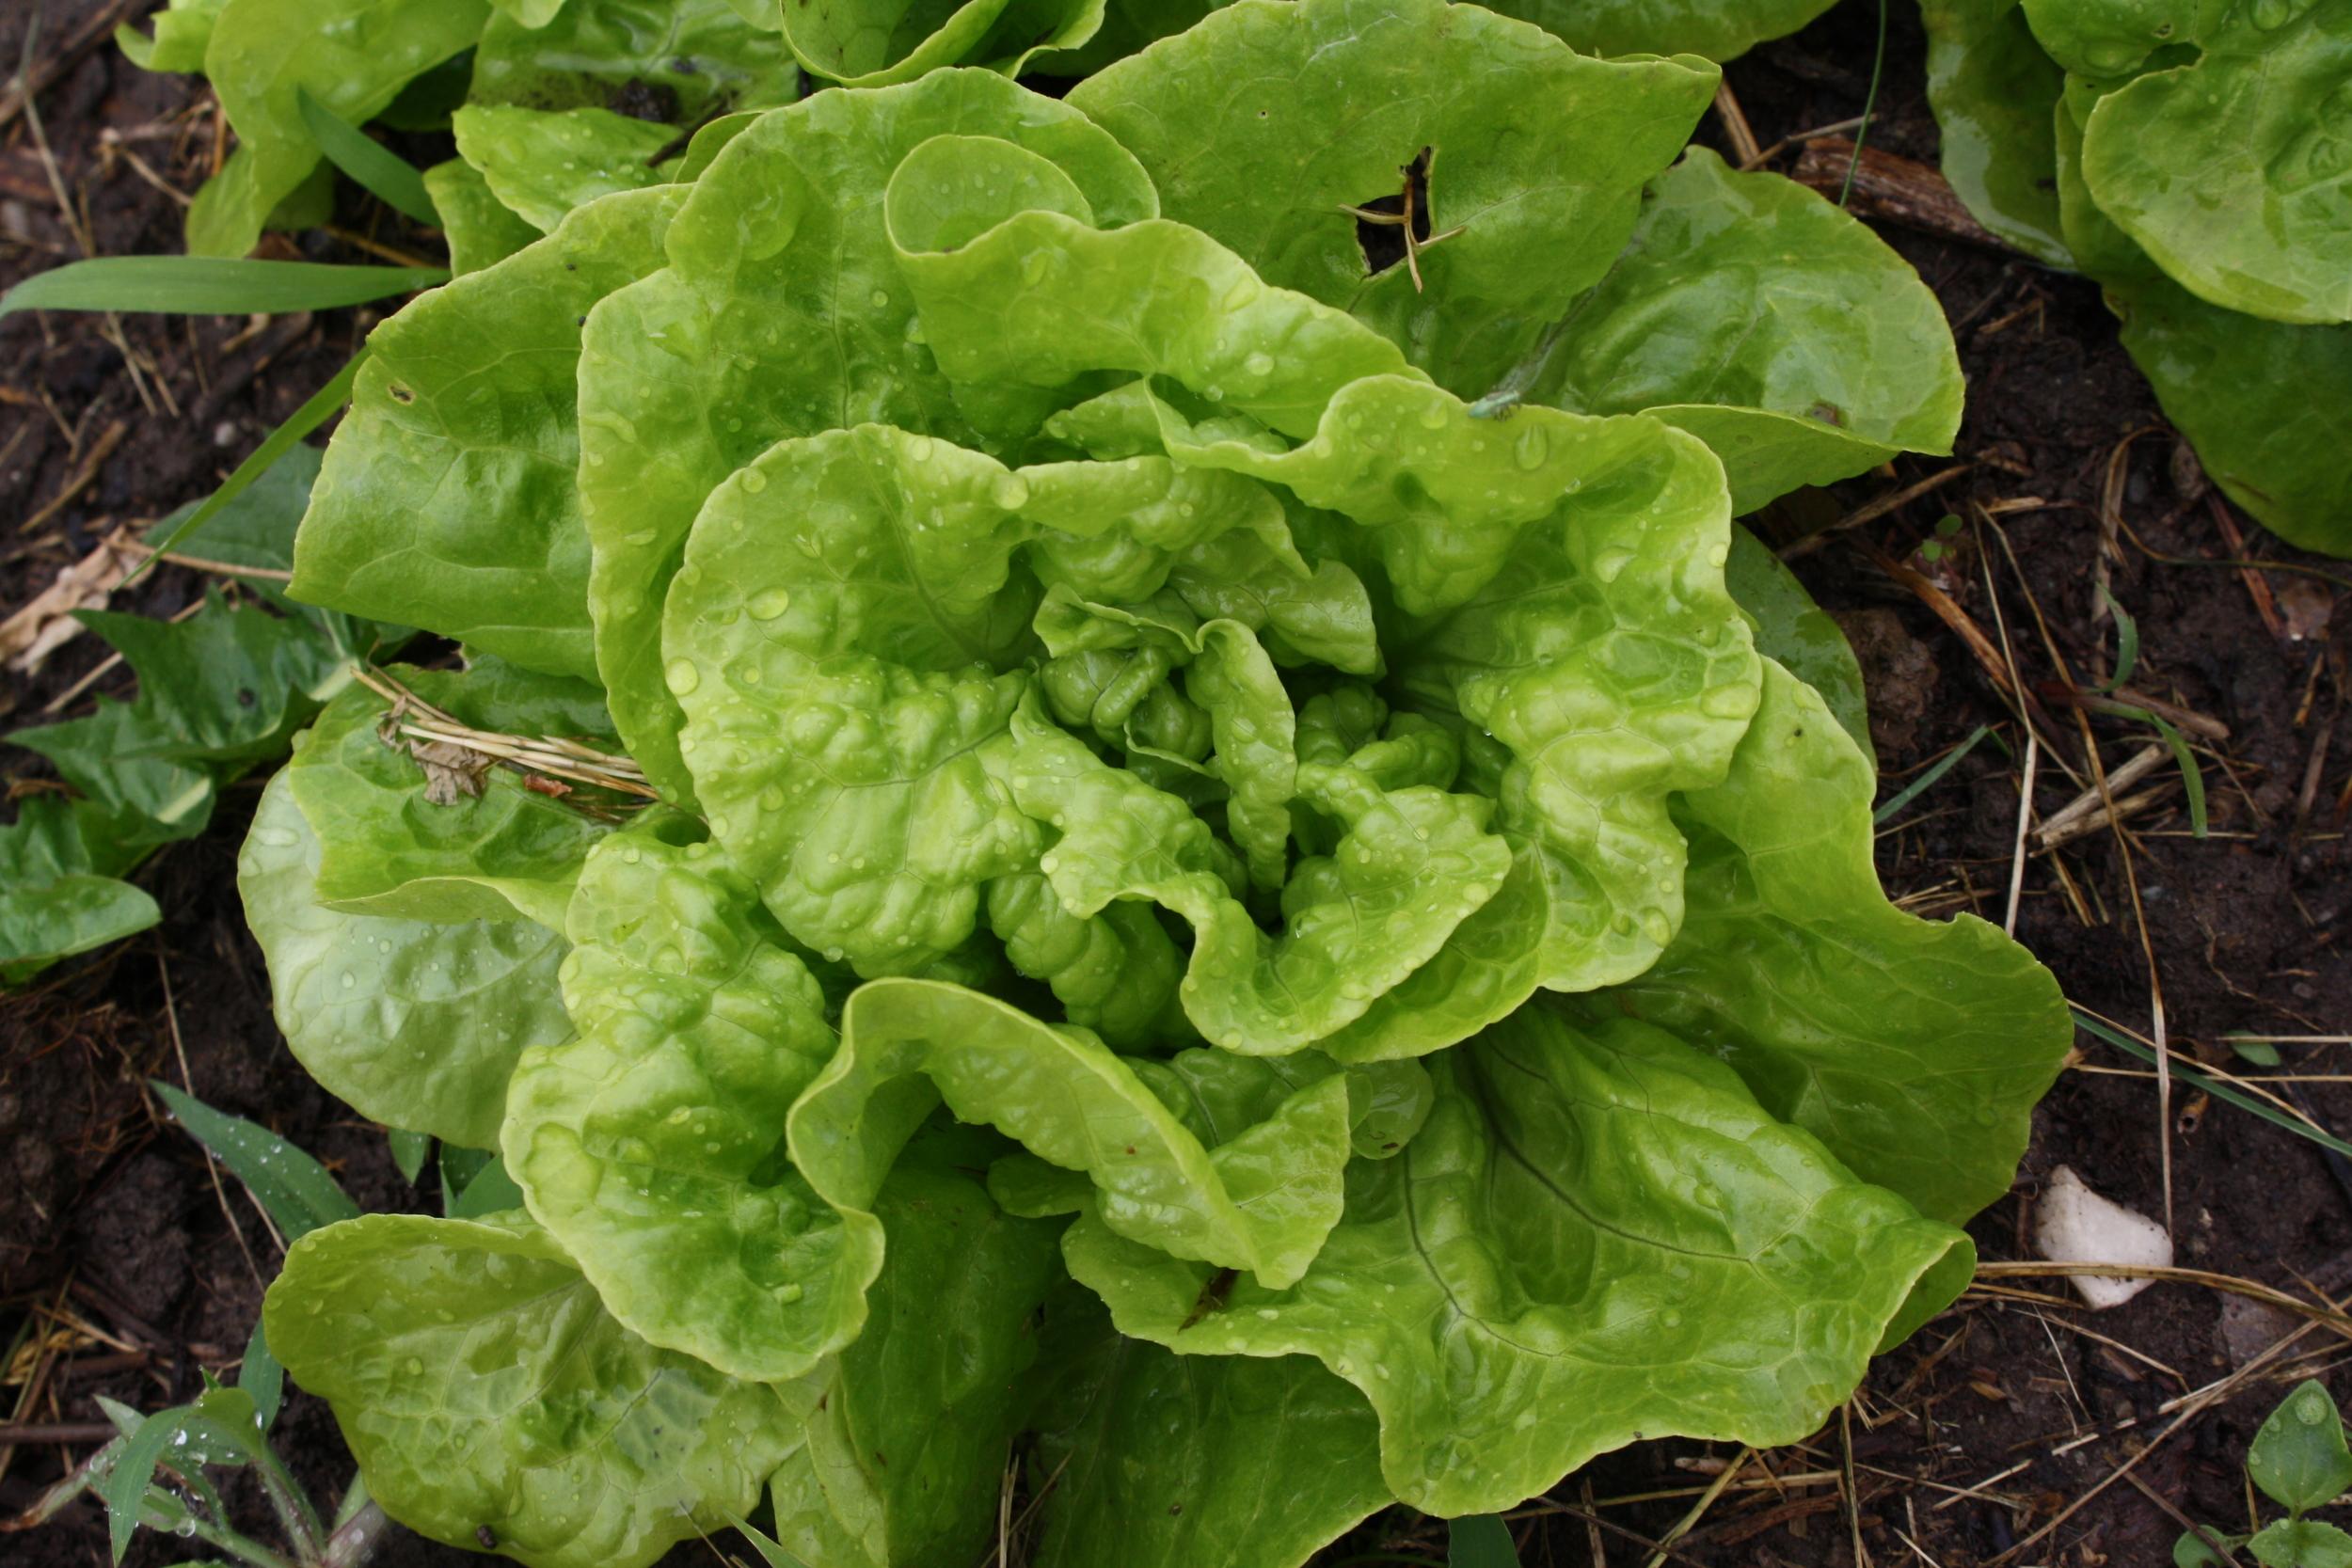 'Tom Thumb' dwarf butterhead lettuce